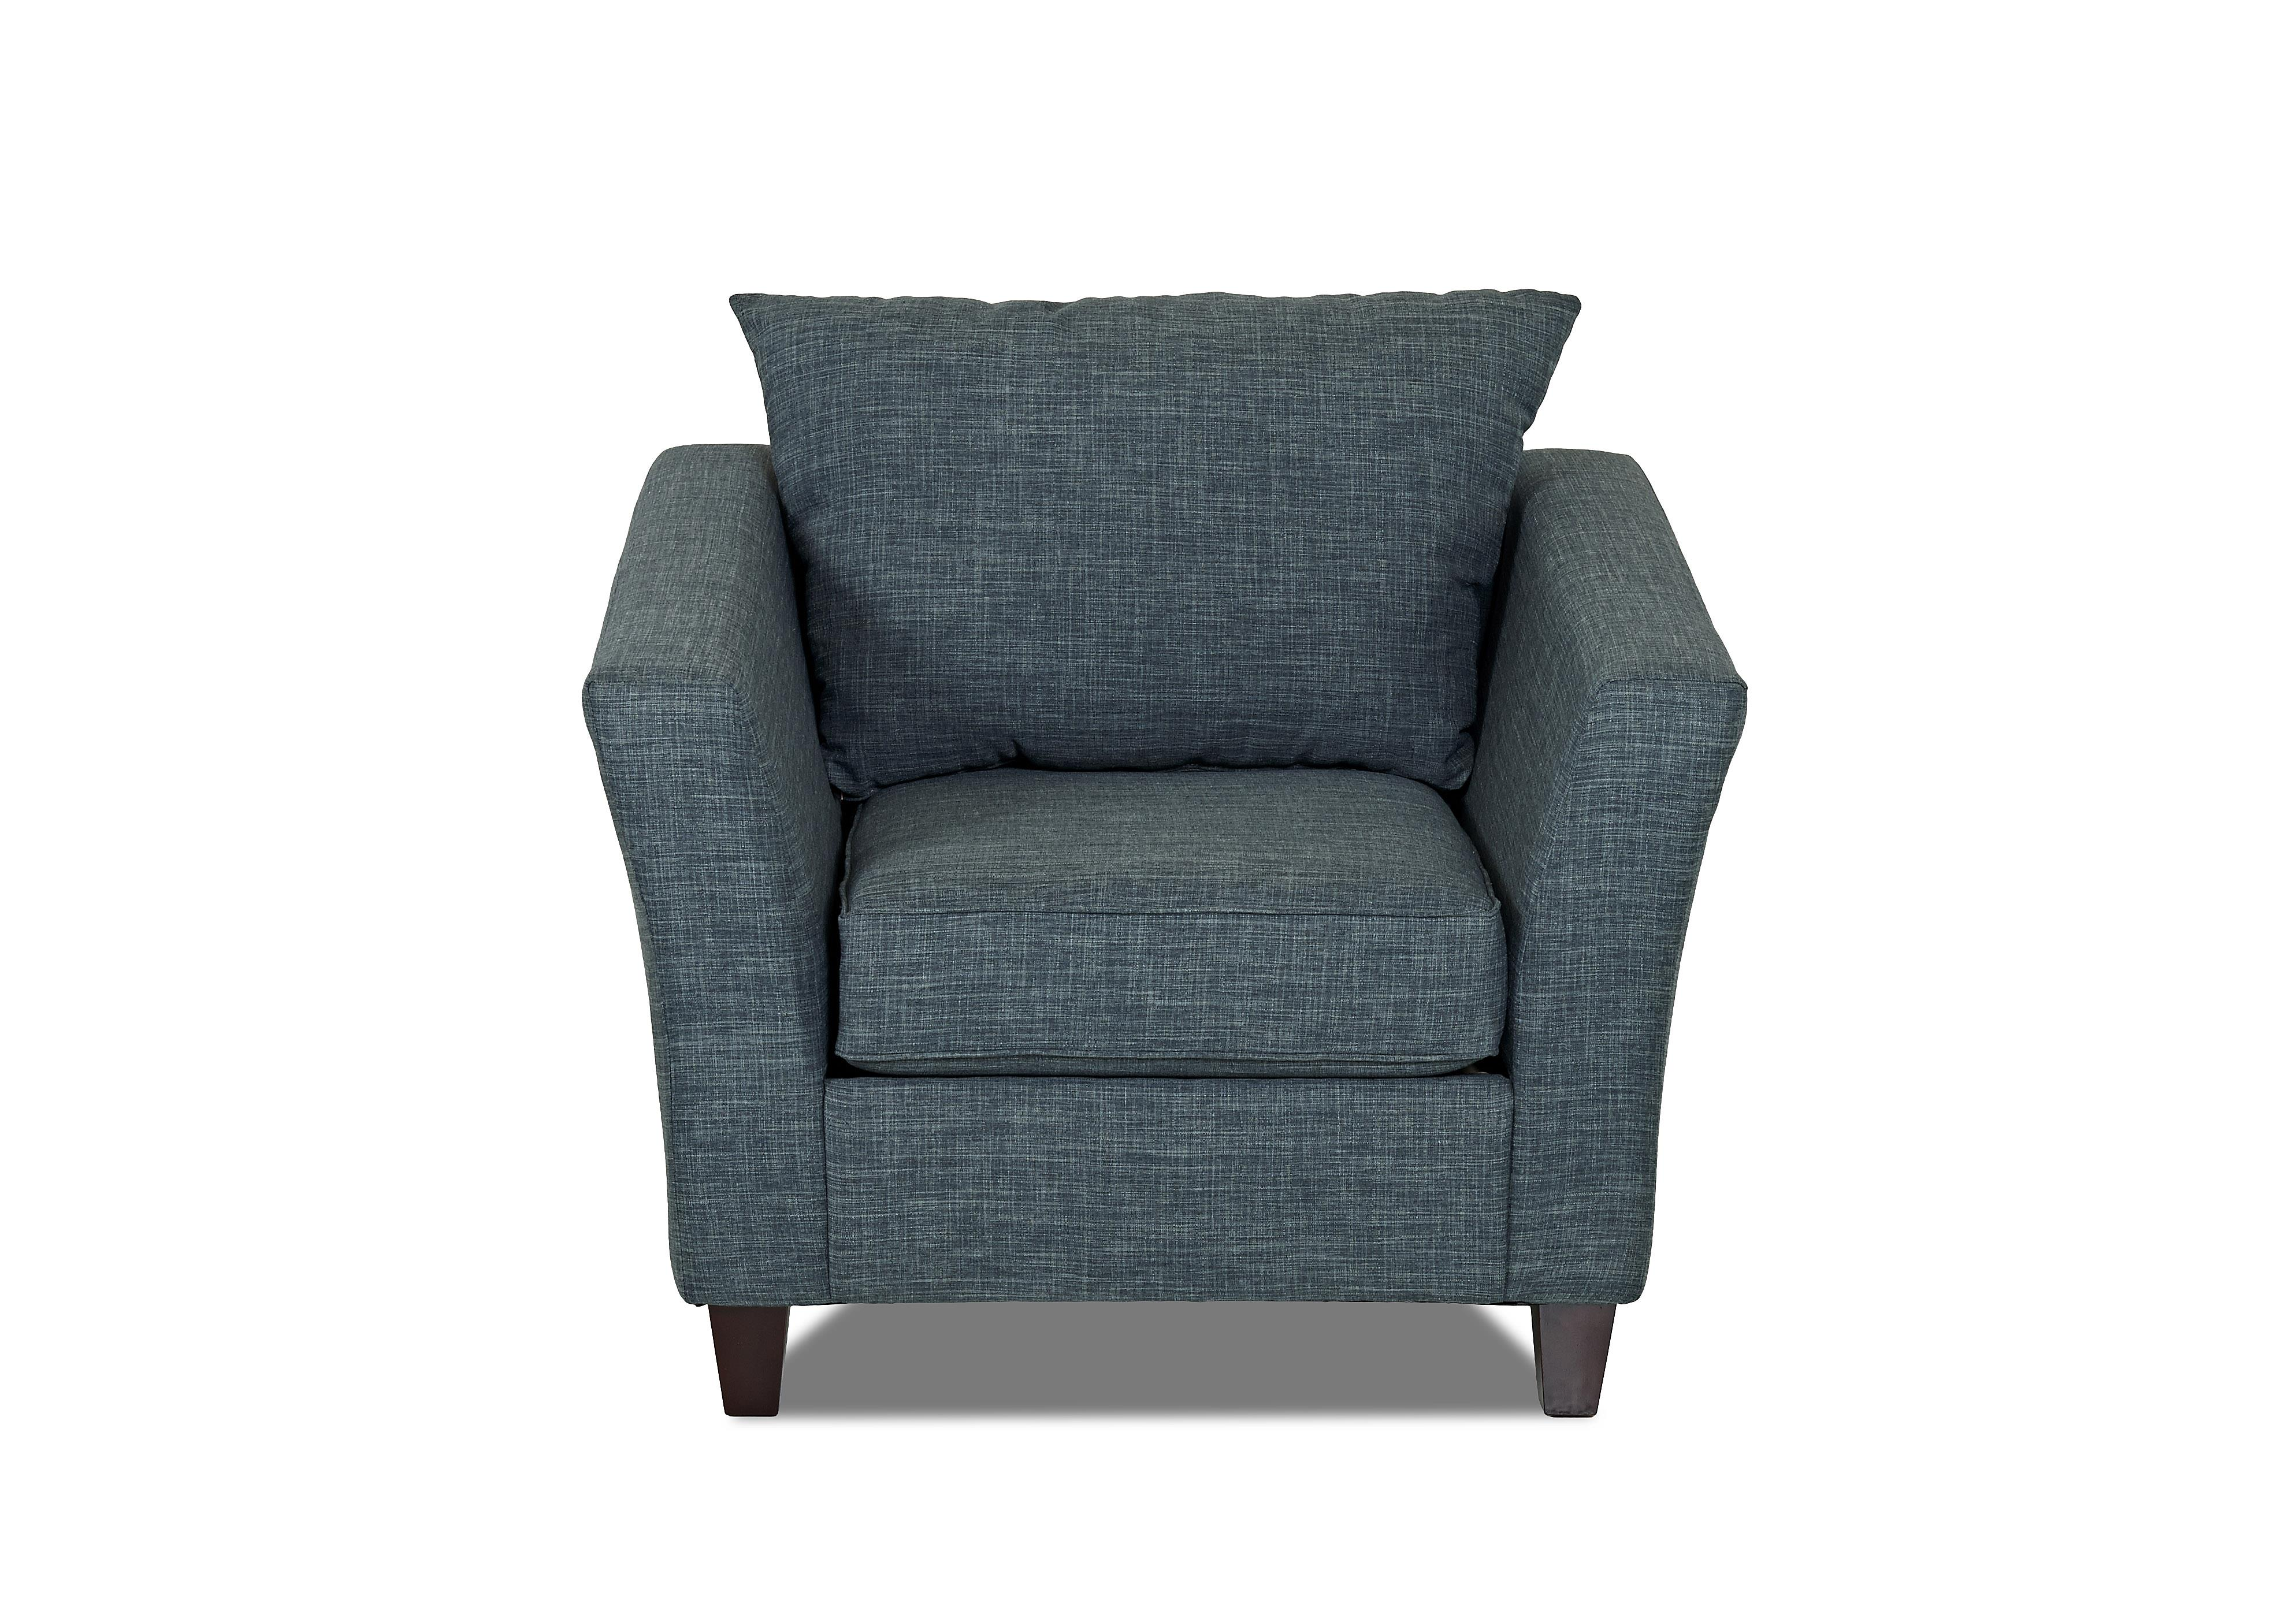 Klaussner Culpepper Chair - Item Number: K40000 C-Fand-Turq